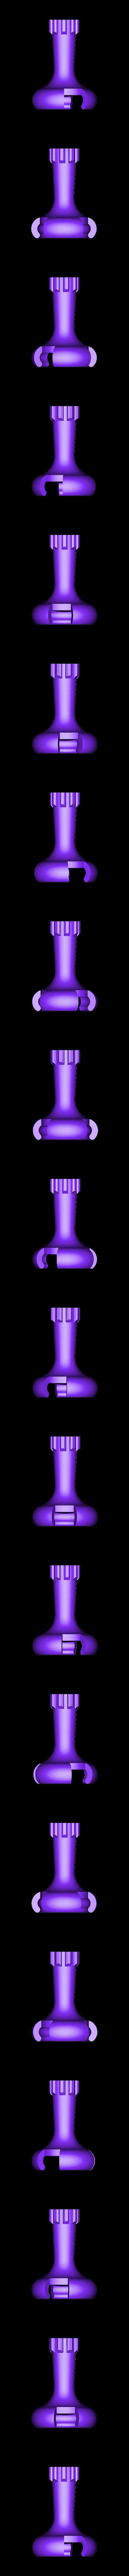 XBOX_Stick_V1_1_new.stl Download free STL file XBOX One stick extender for drone simulators • 3D printable object, alkobua